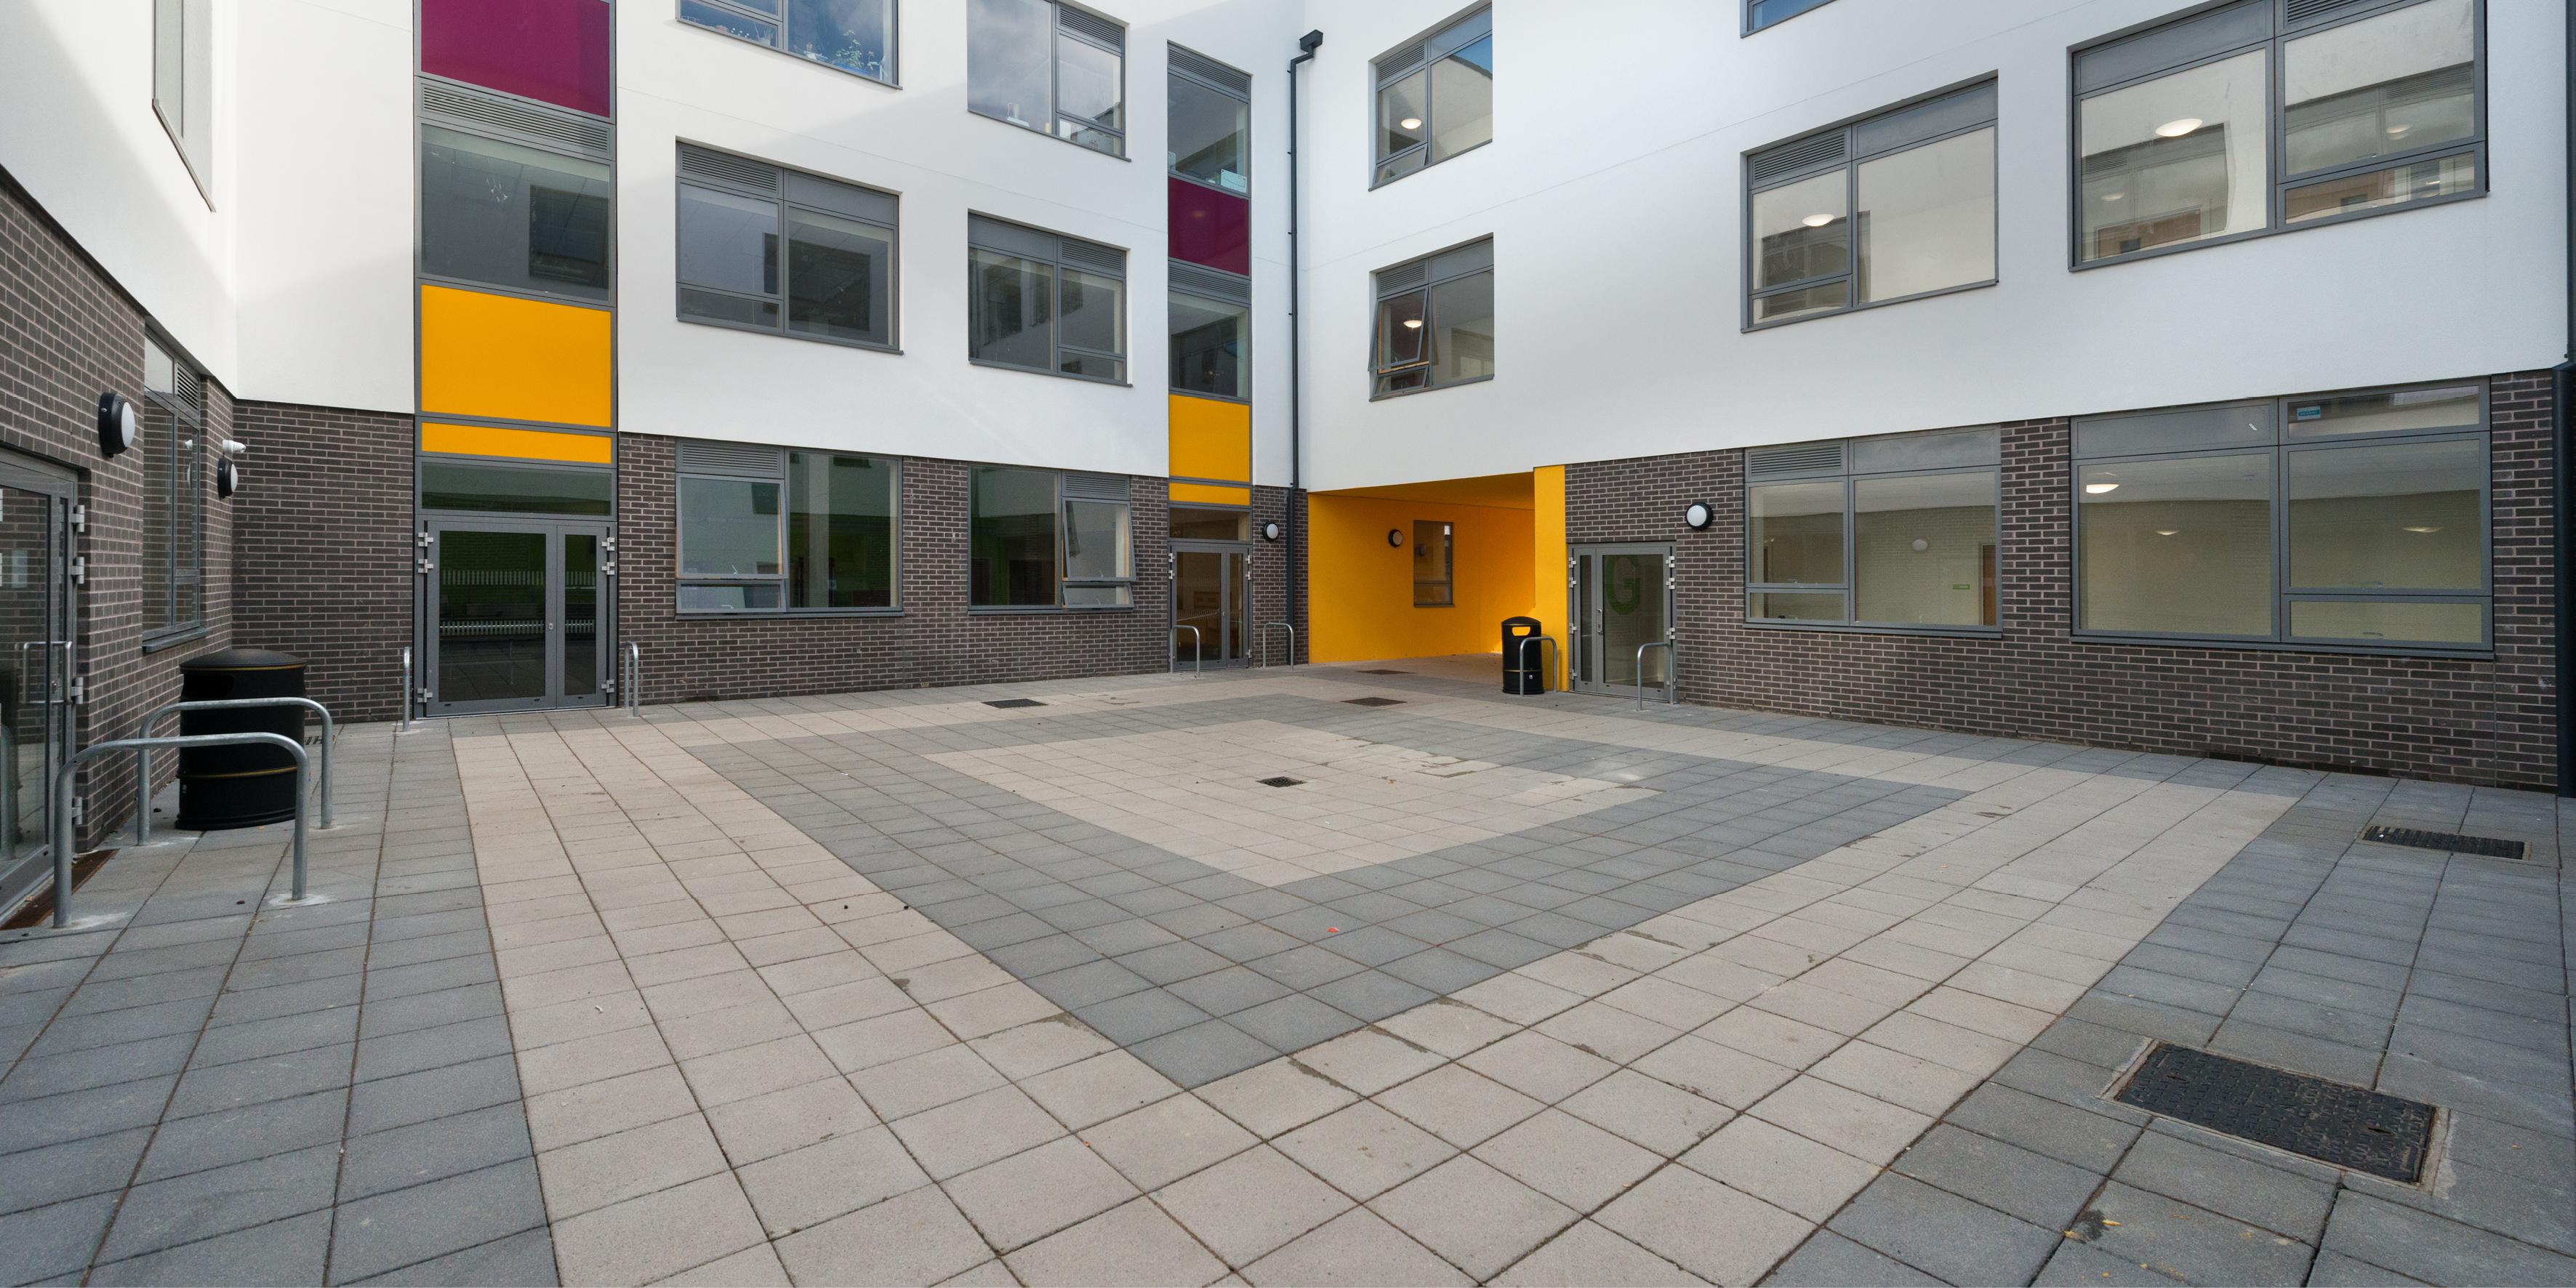 Meopham School